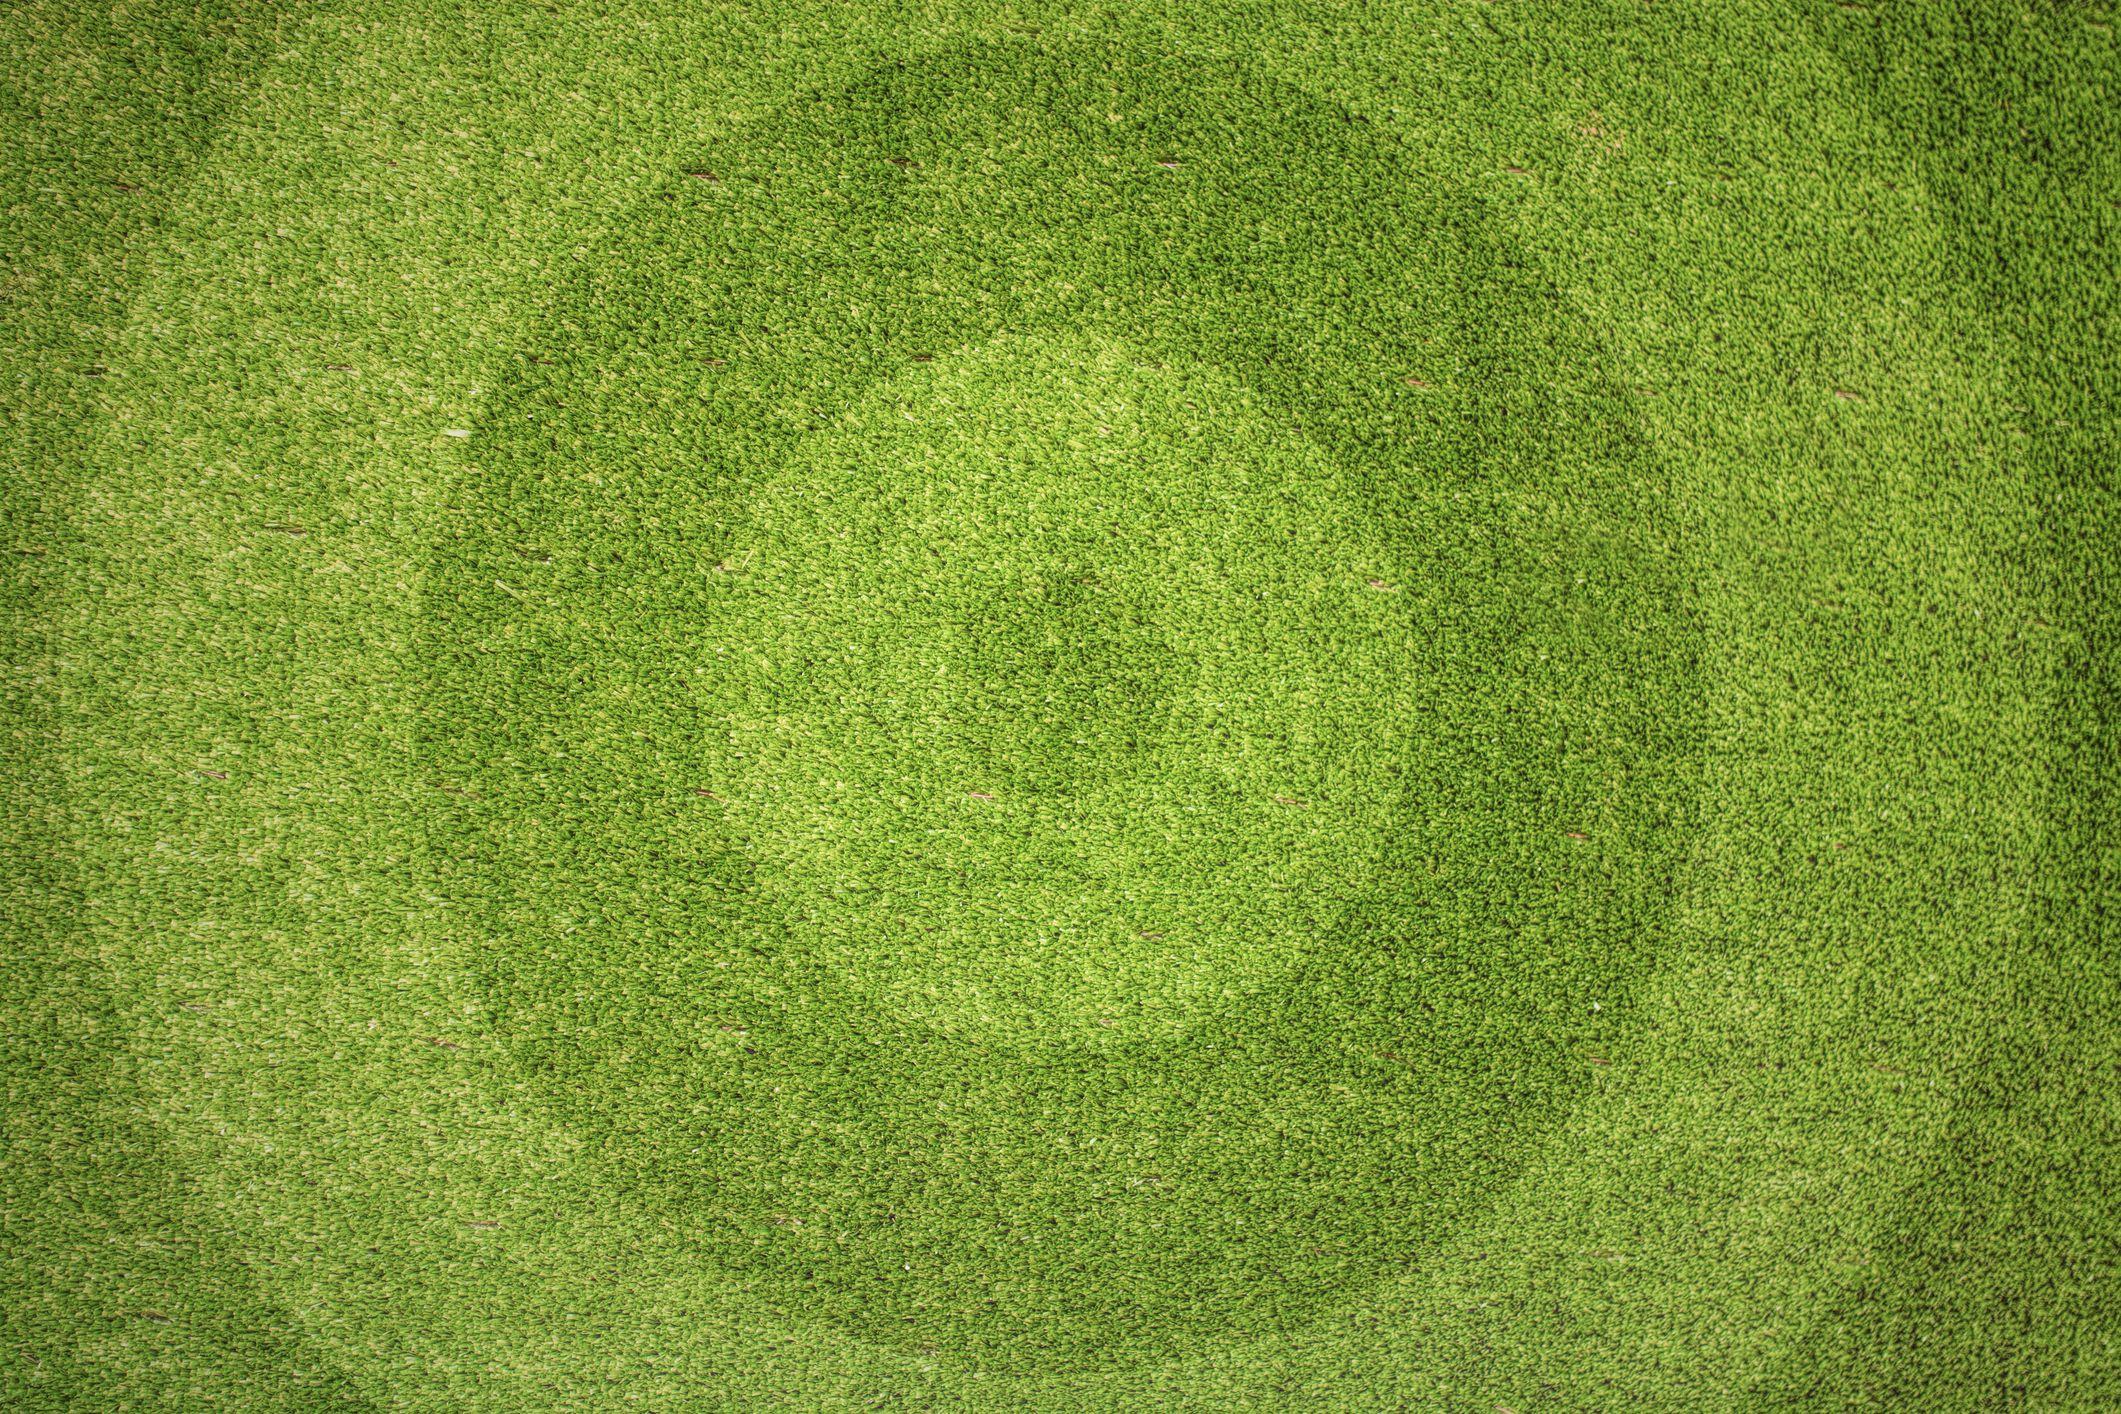 Patterned lawn - Argos garden trends 2018